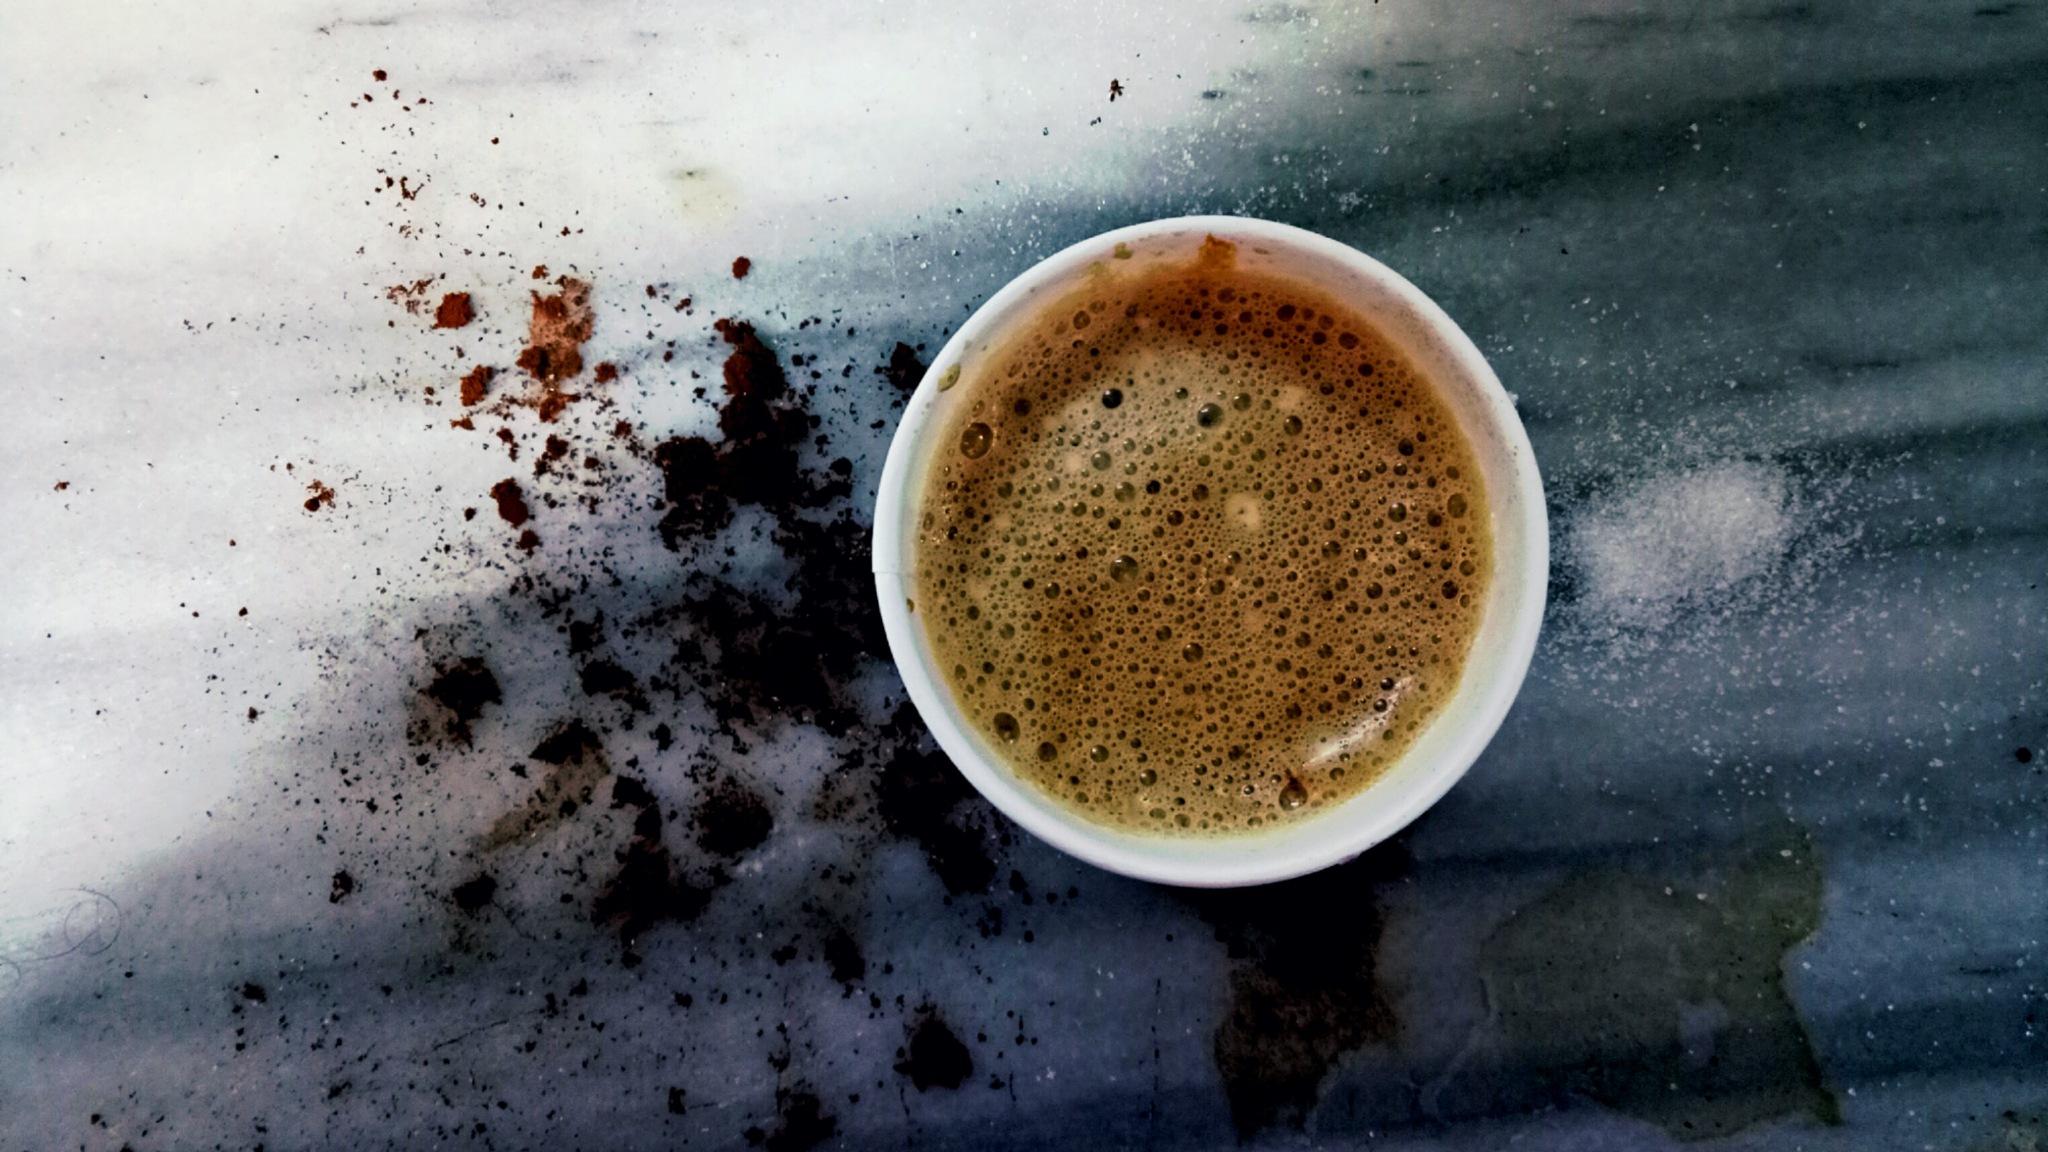 coffee making mess  by SaadOz Mahadeen